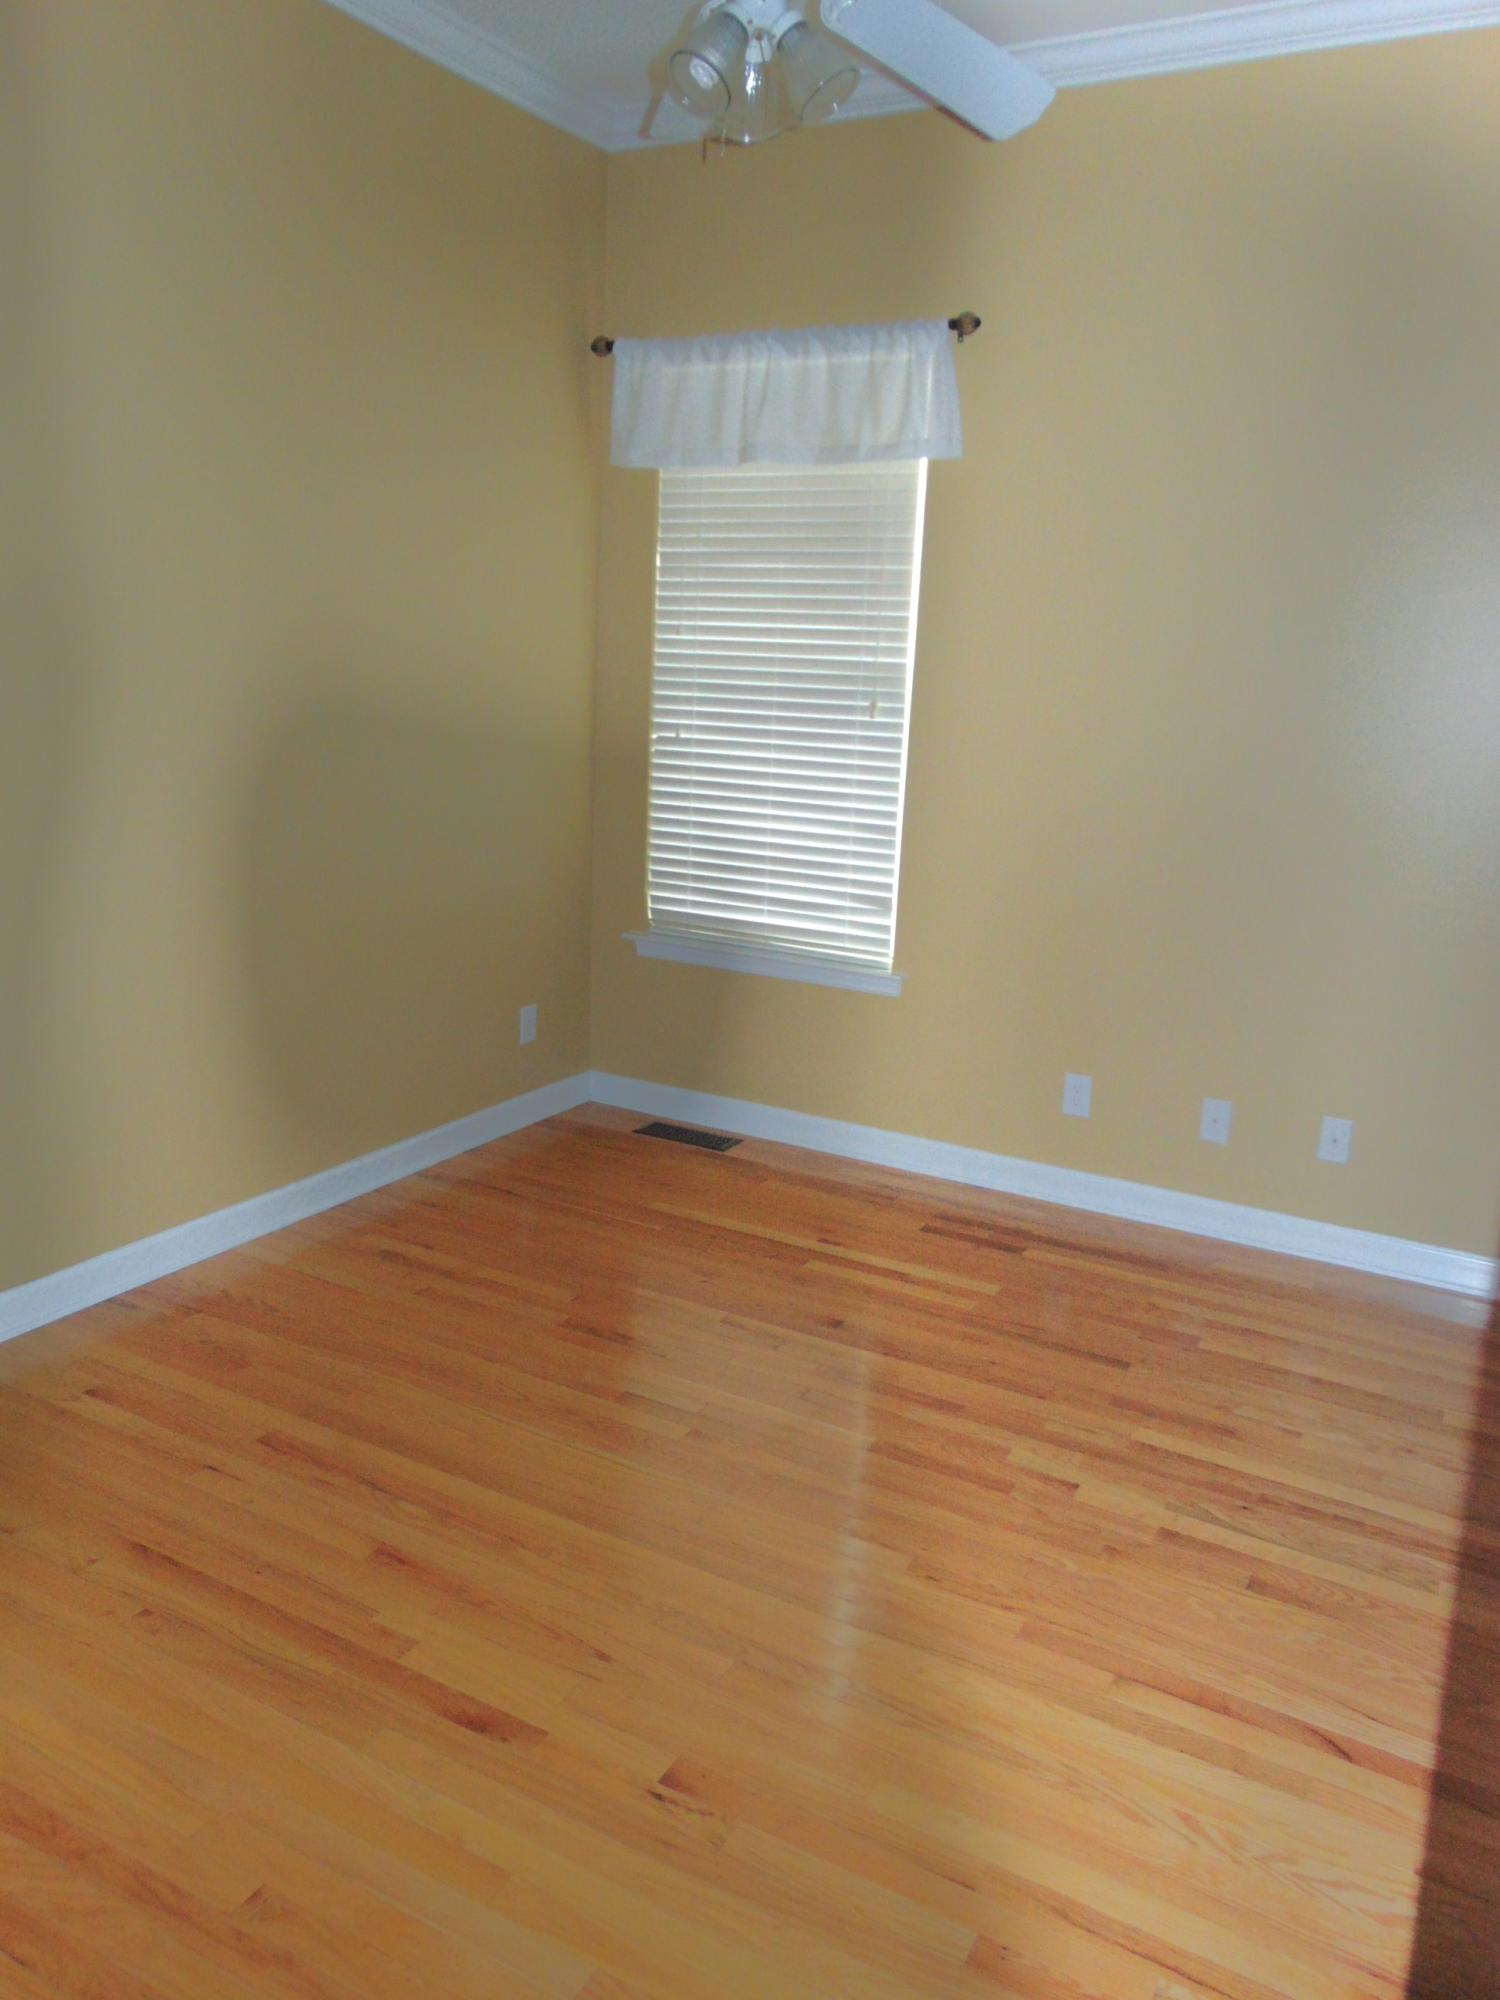 Park West Homes For Sale - 3435 Toomer Kiln, Mount Pleasant, SC - 3